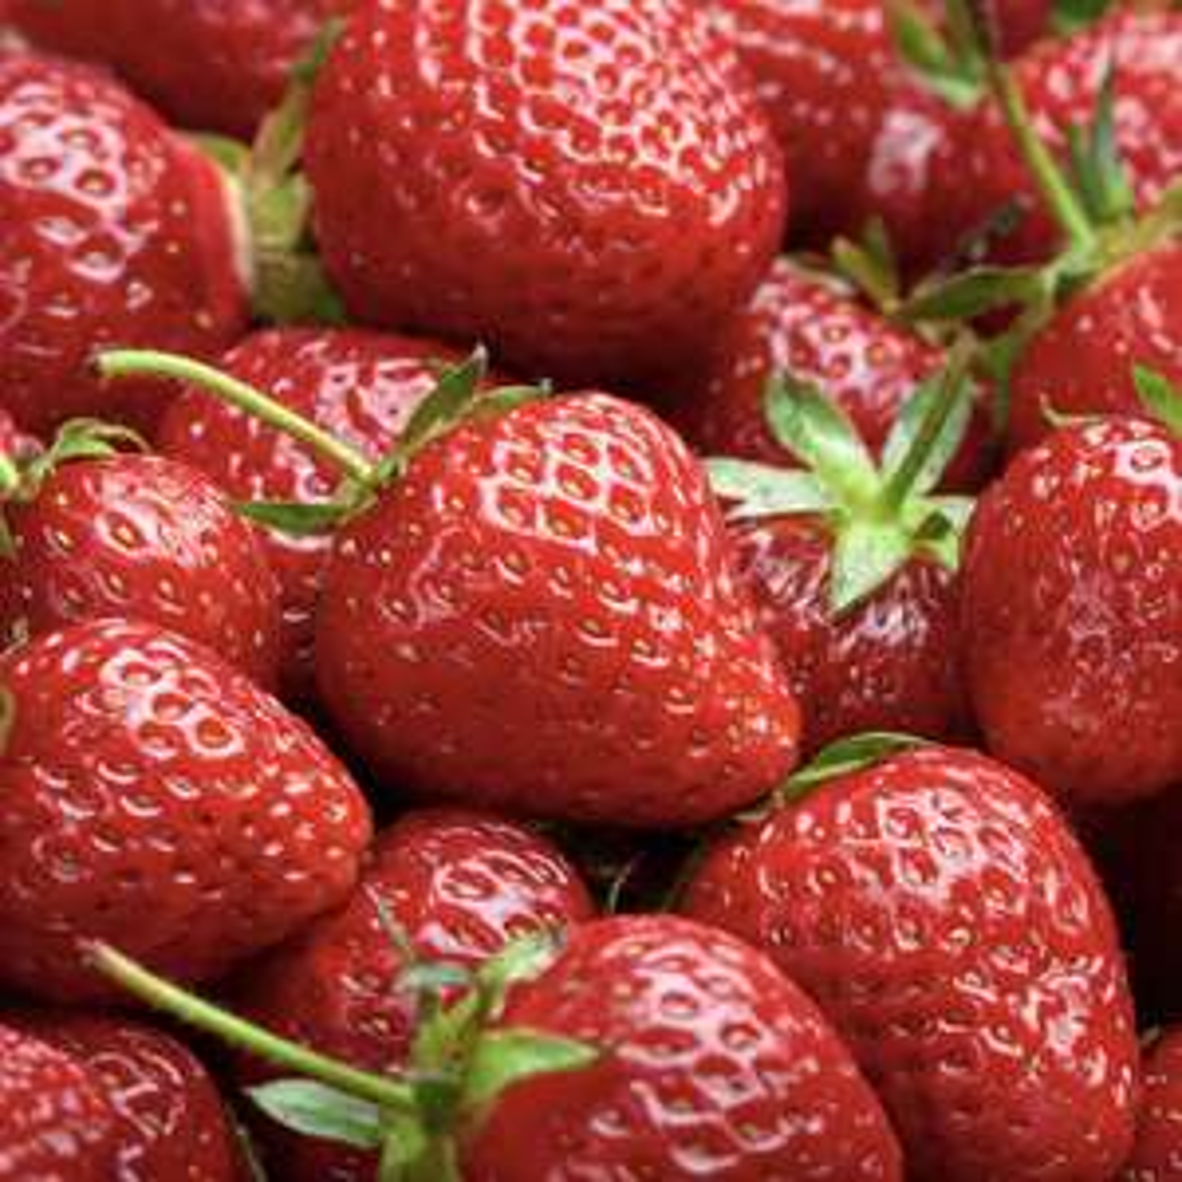 [Penny] Sehr lecker! Erdbeeren Klasse 1 in der 500g Schale - nur bis Framstag